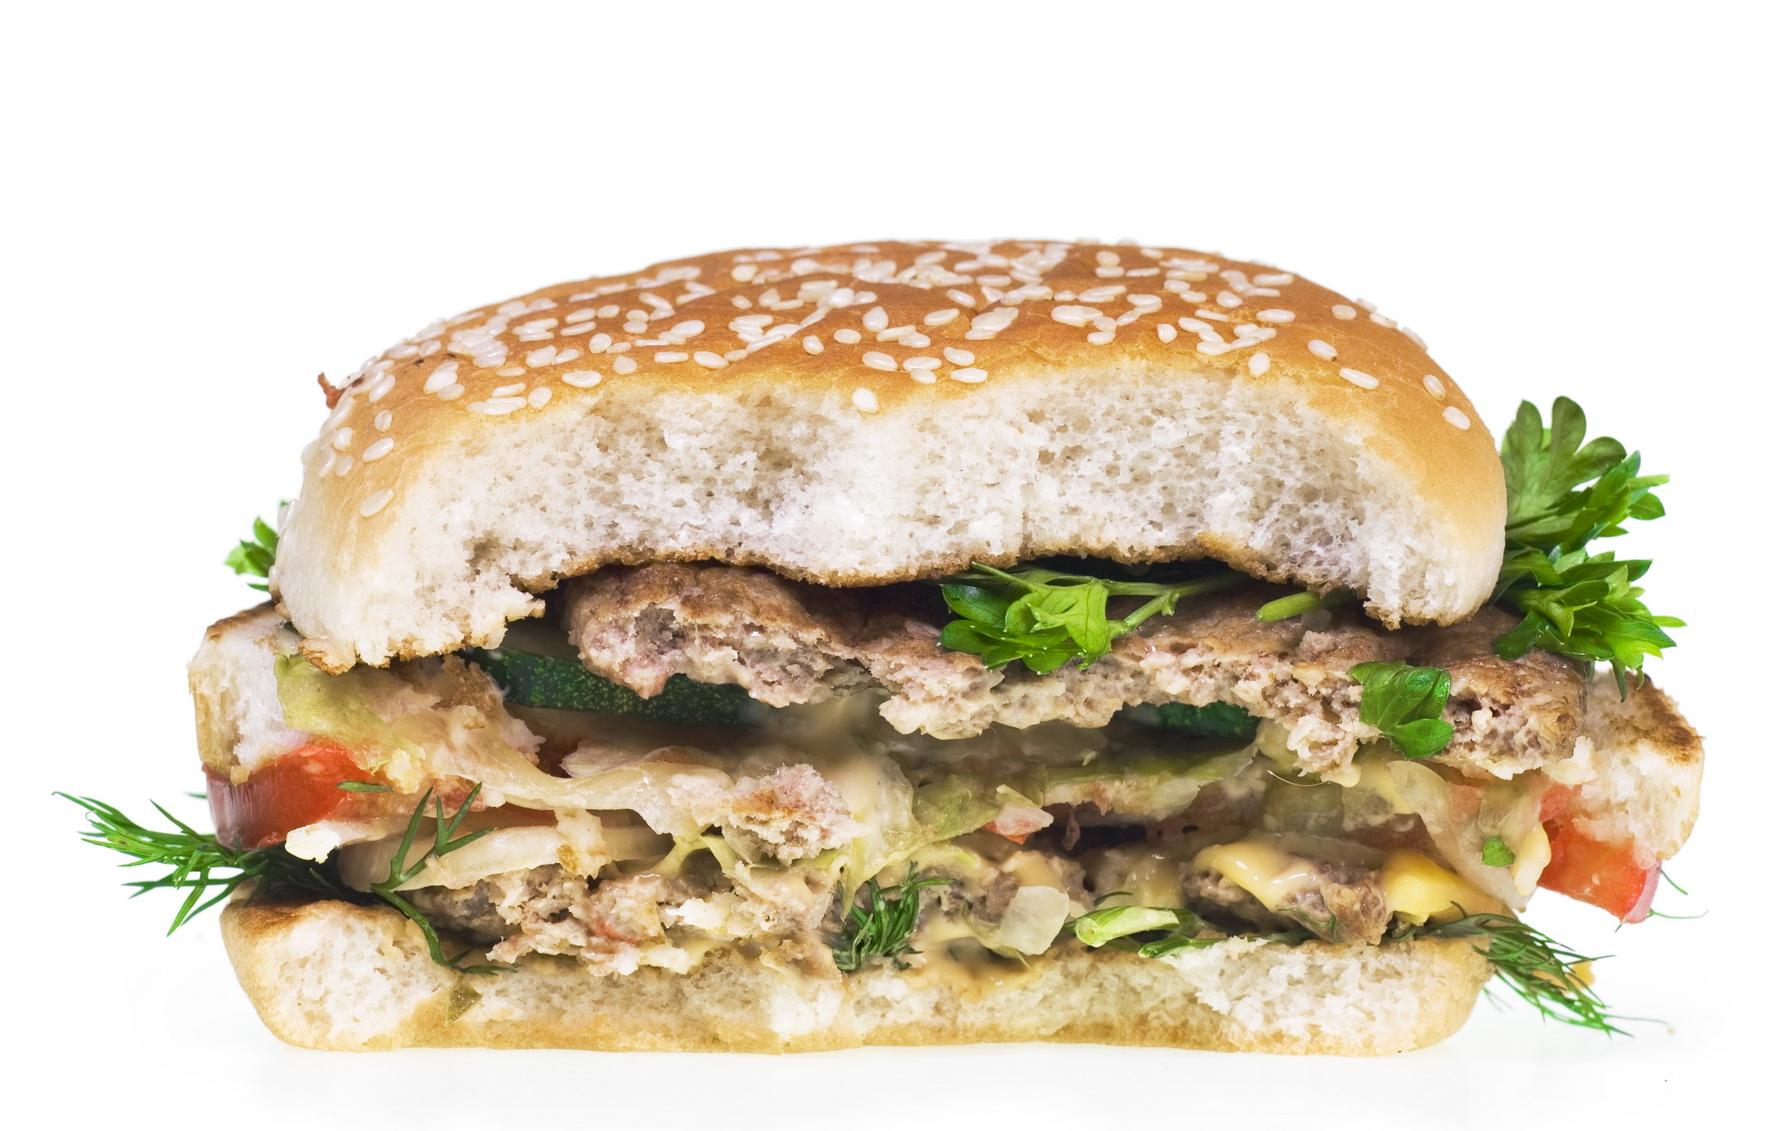 Half Eaten Hamburger, American, Hamburger, Unhealthy, Tasty, HQ Photo